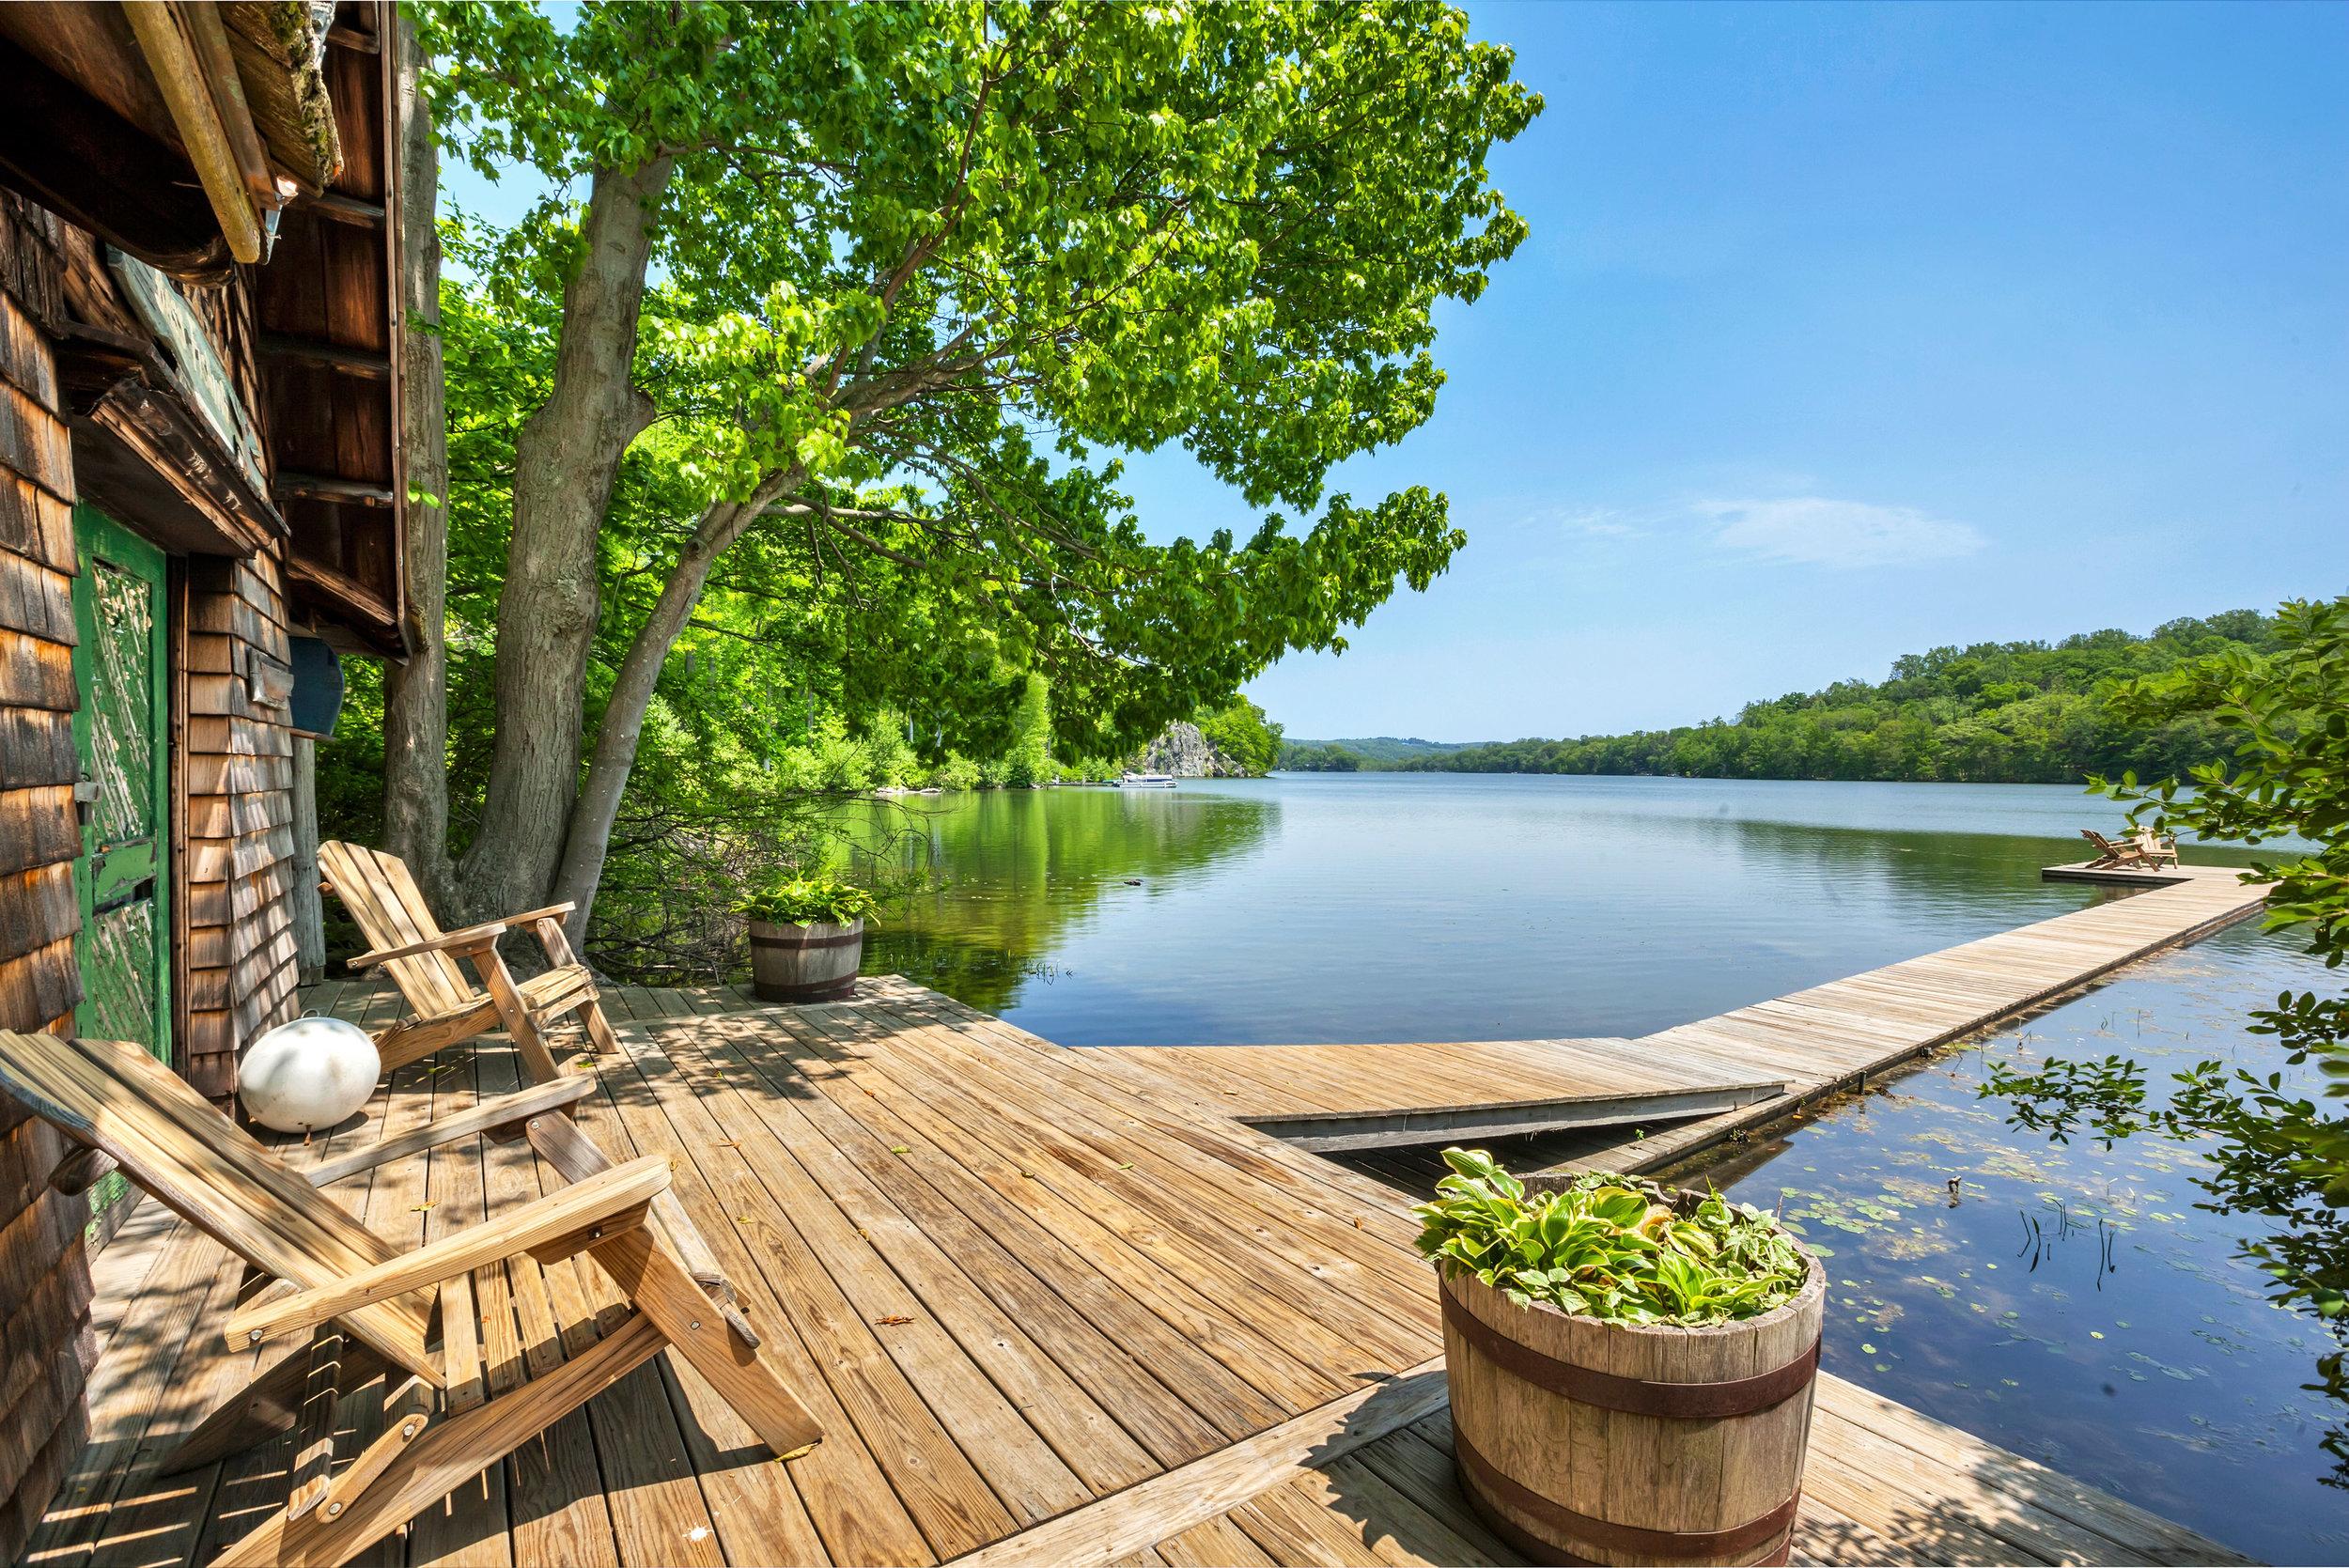 Lakefront Rental, Westchester NY - $38,500/mo.